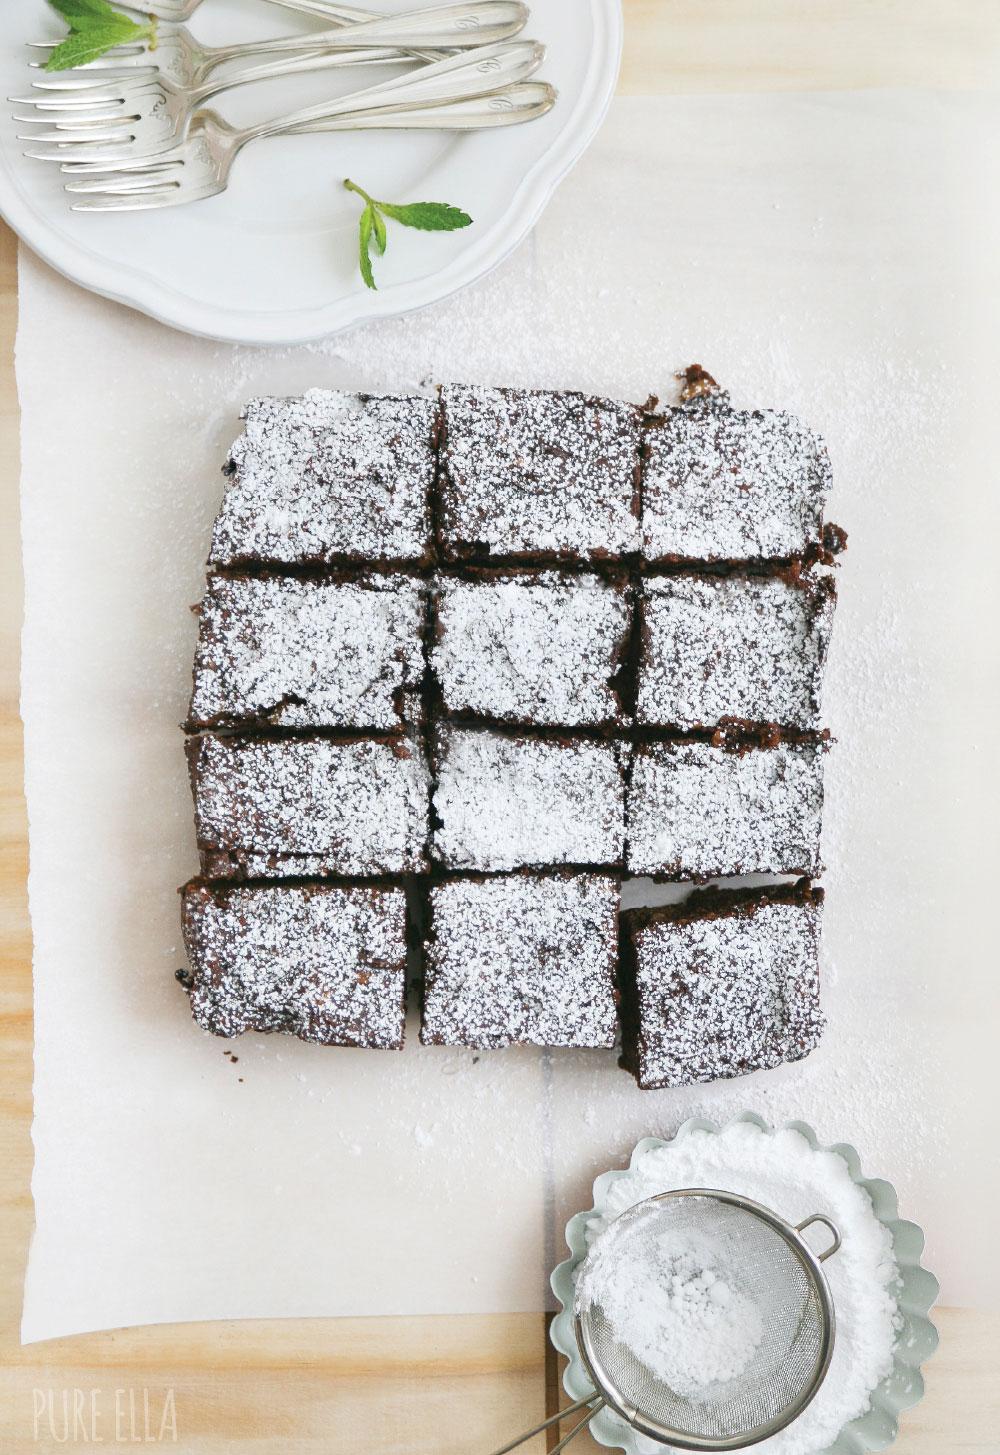 Pure-Ella-Guilt-free-Chocolate-Sweet-Potato-Brownies5